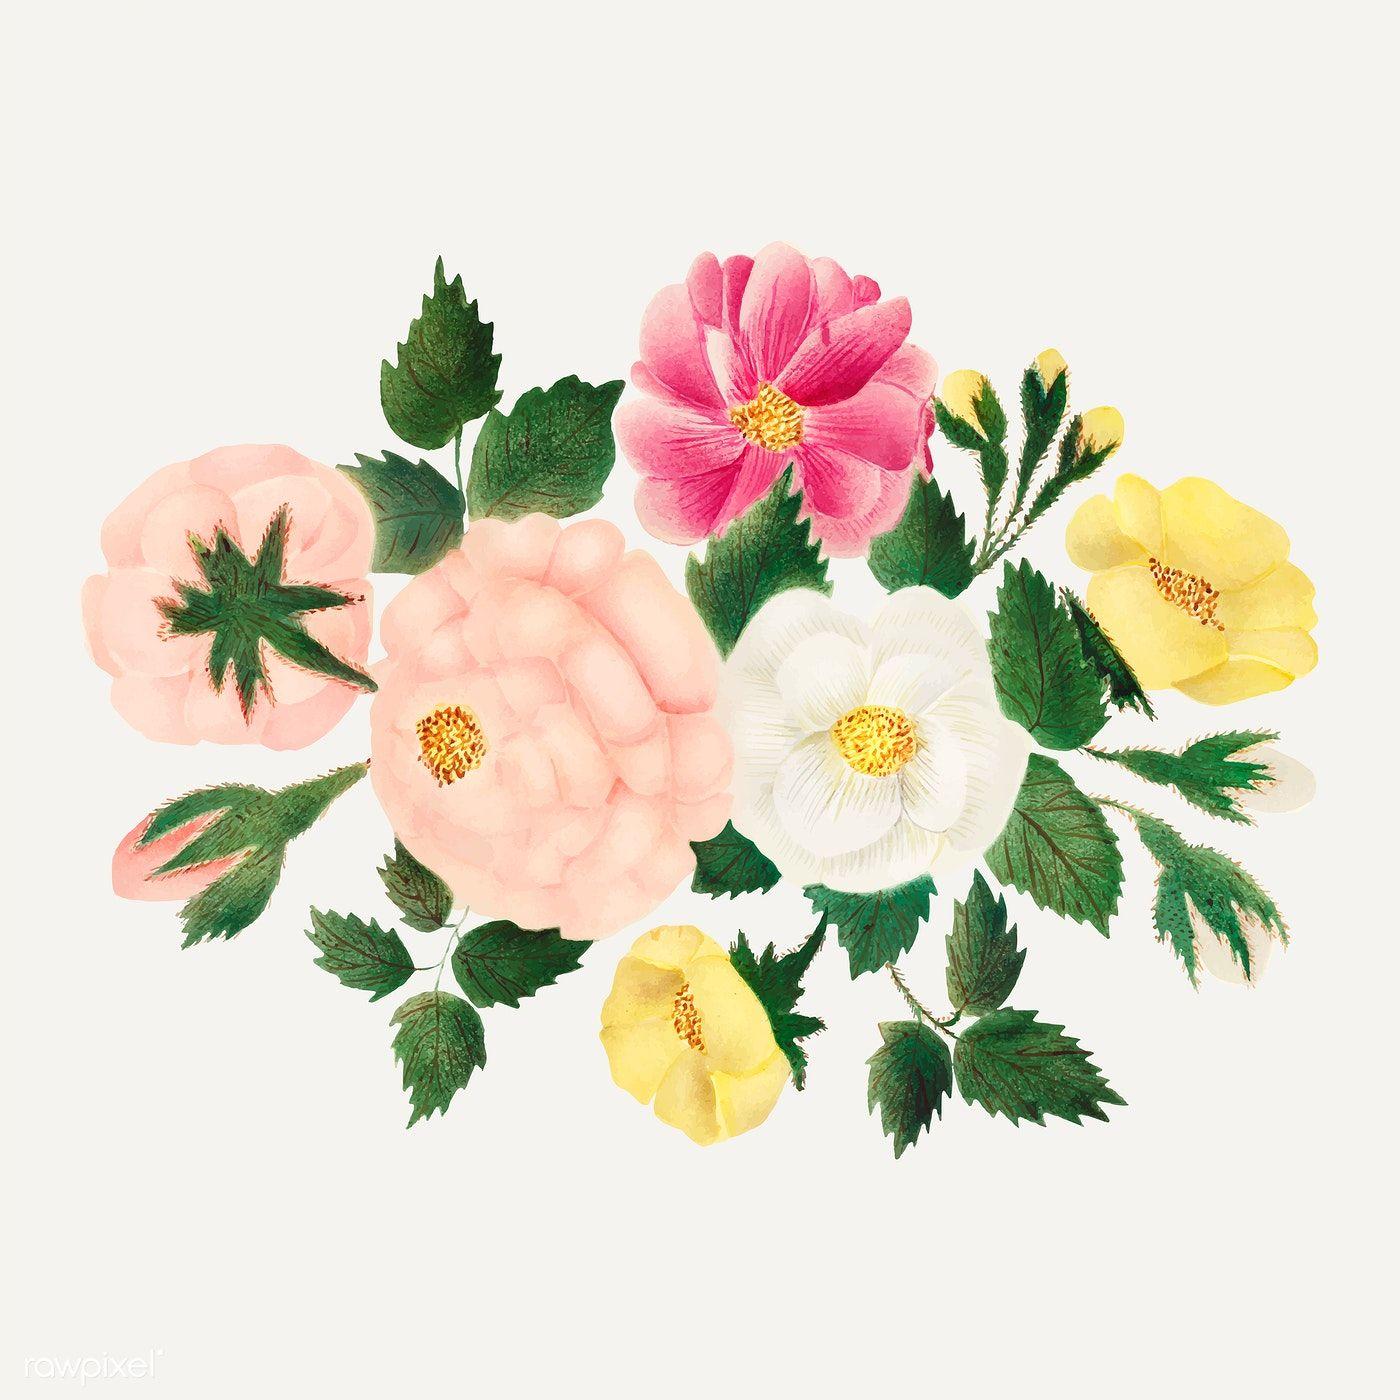 June roses vintage illustration vector premium image by